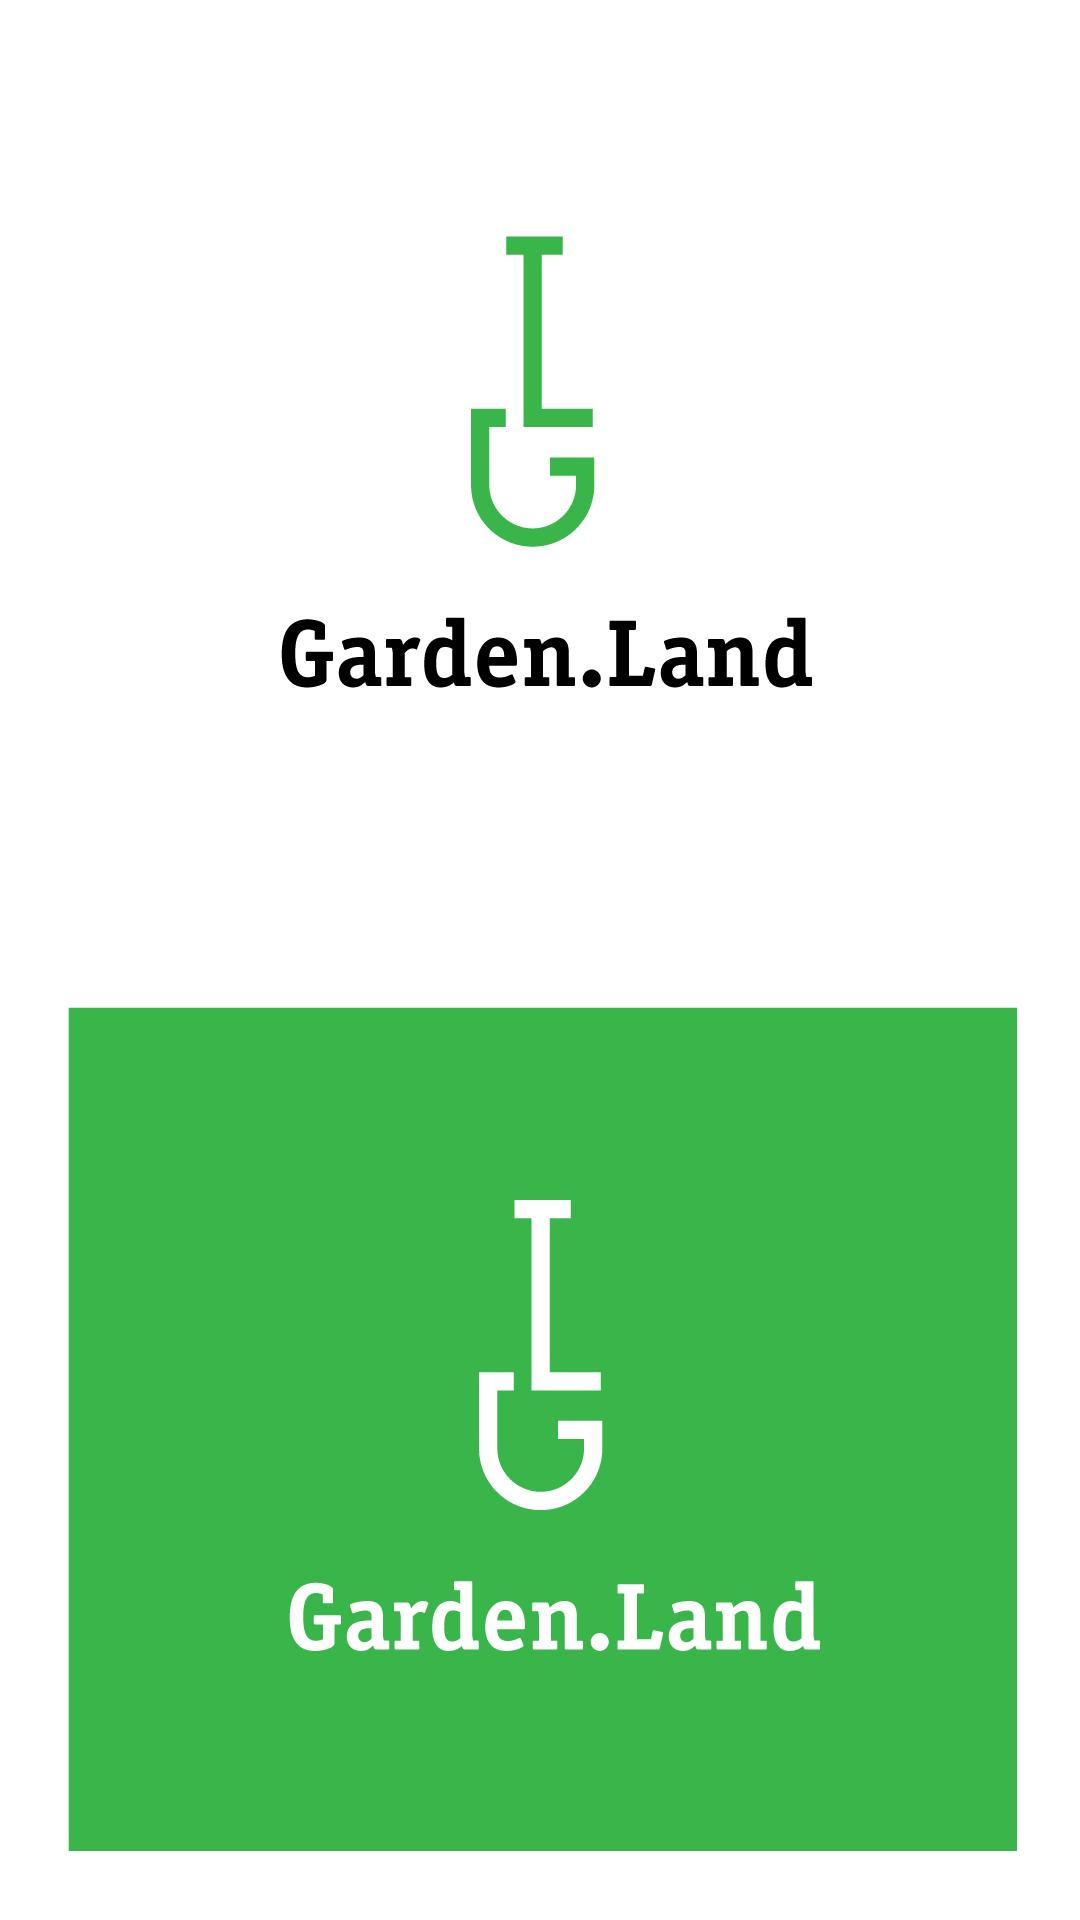 Создание логотипа компании Garden.Land фото f_83659876fa9060d7.jpg